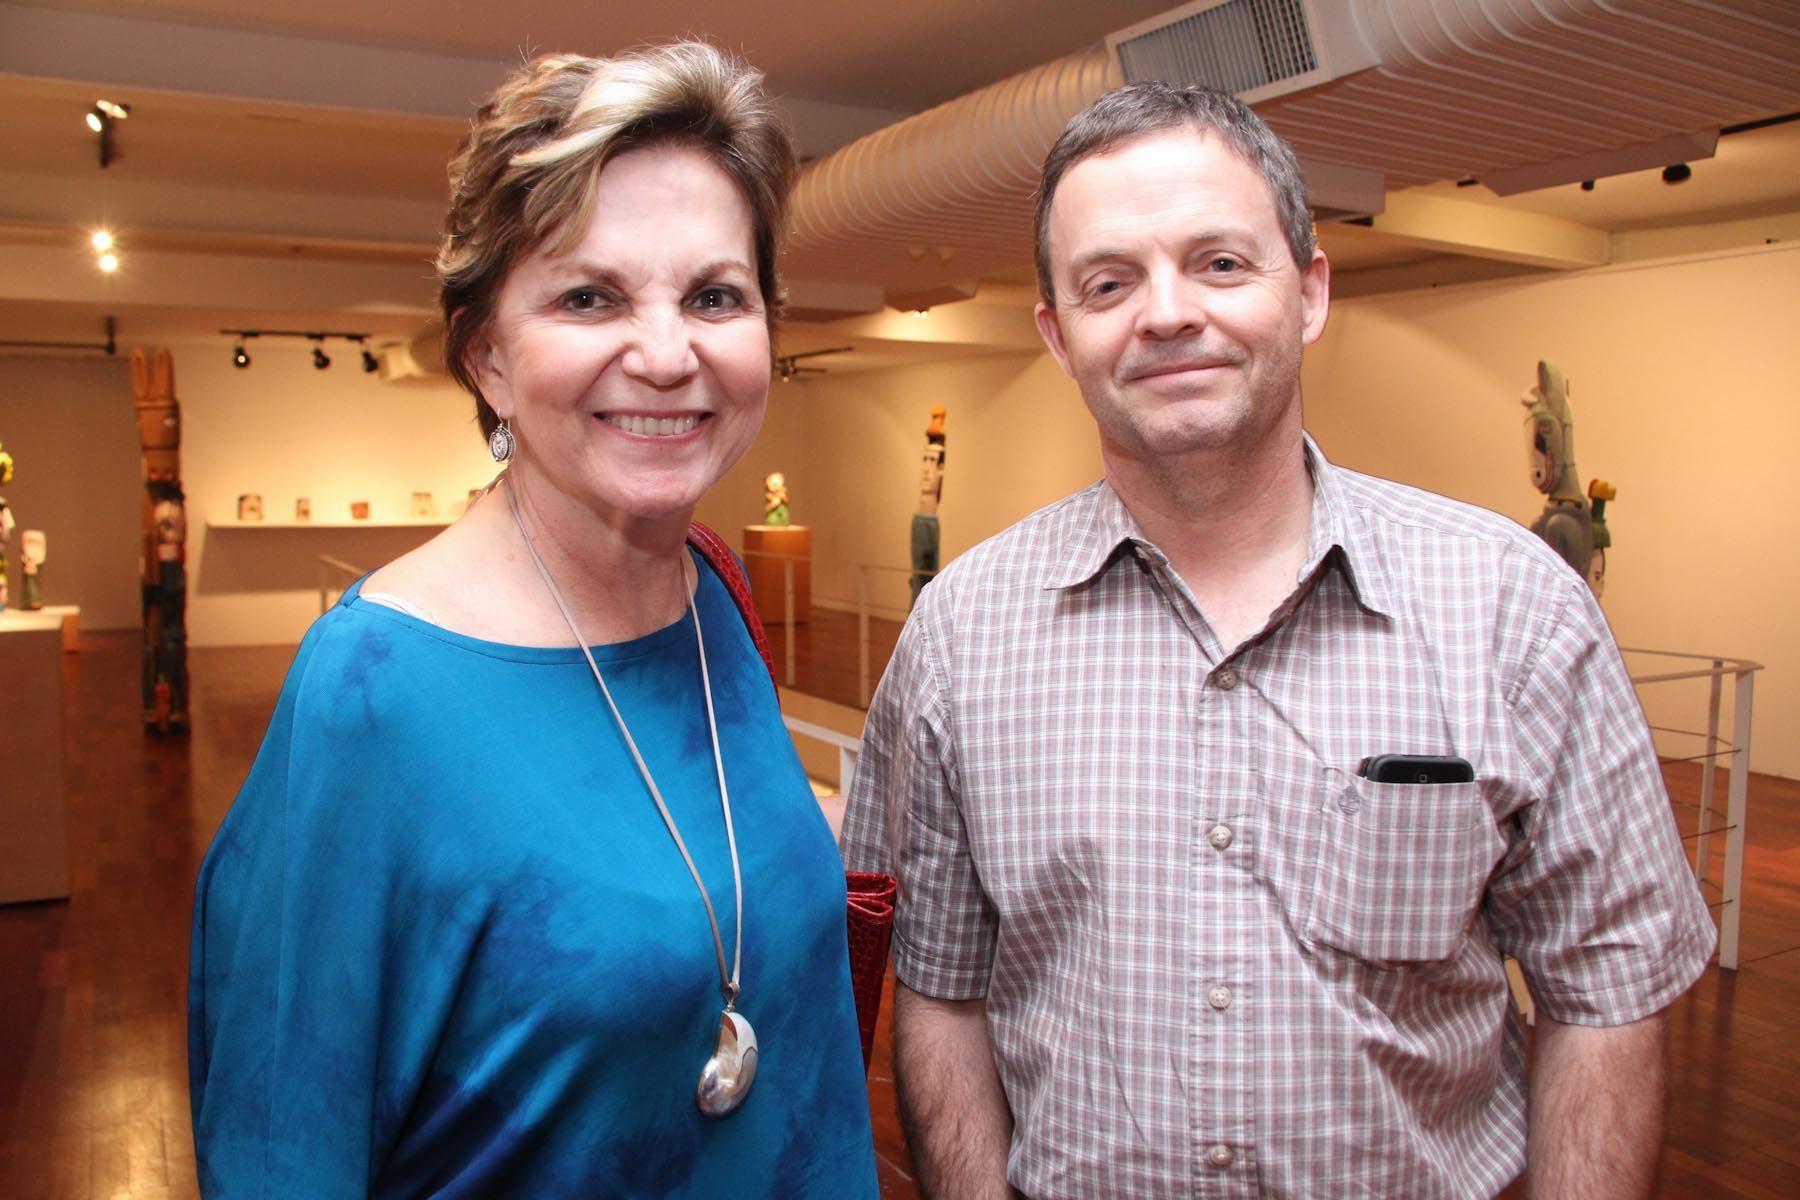 Ana Paula Saraiva e Antônio Coutinho